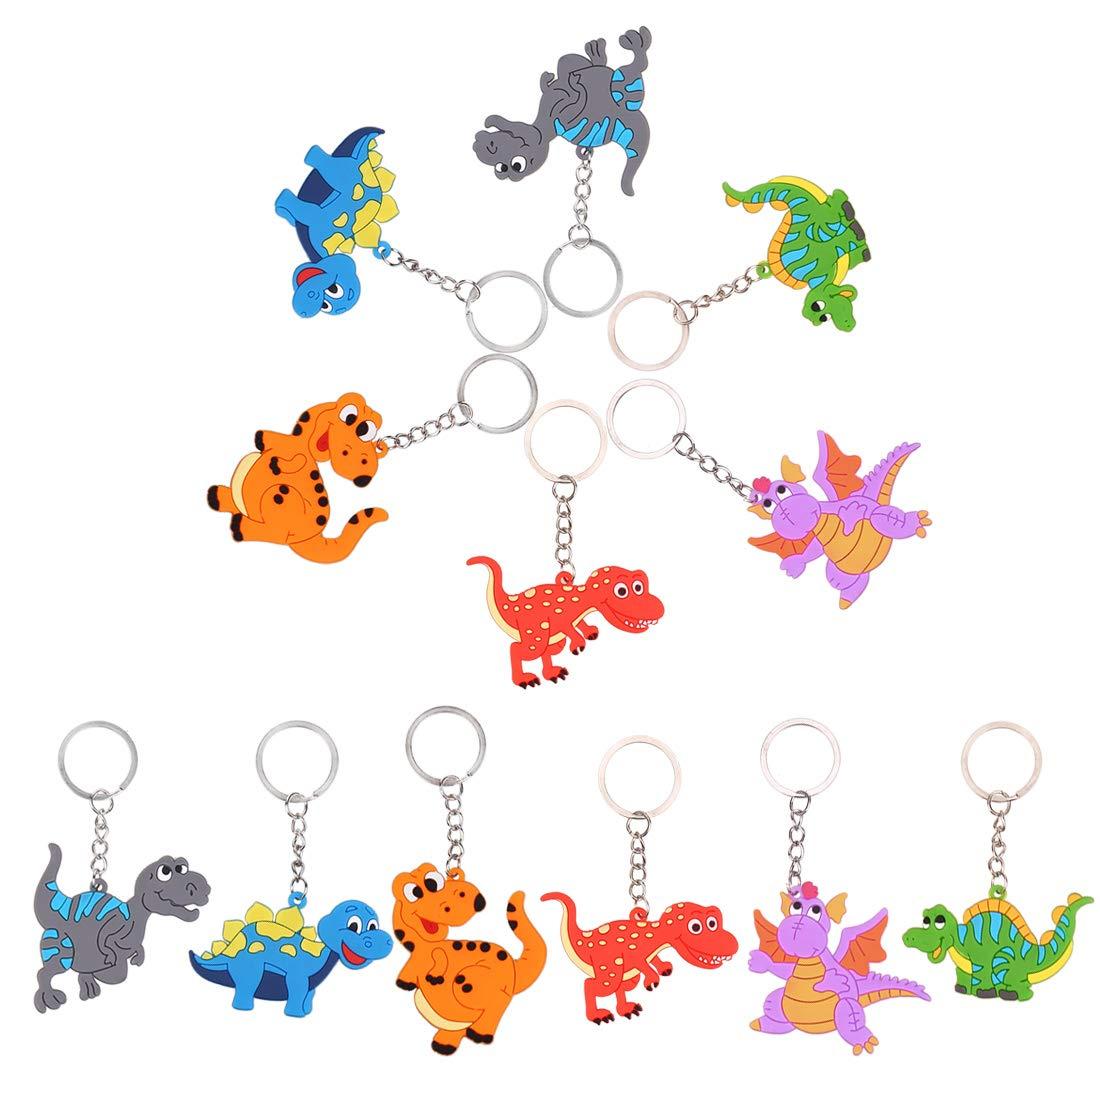 LOKIPA 24Pcs Dinosaur Keyring Keychain Pendant for Kids Party Bag Filler and Dinosaur Party Supplies Favors